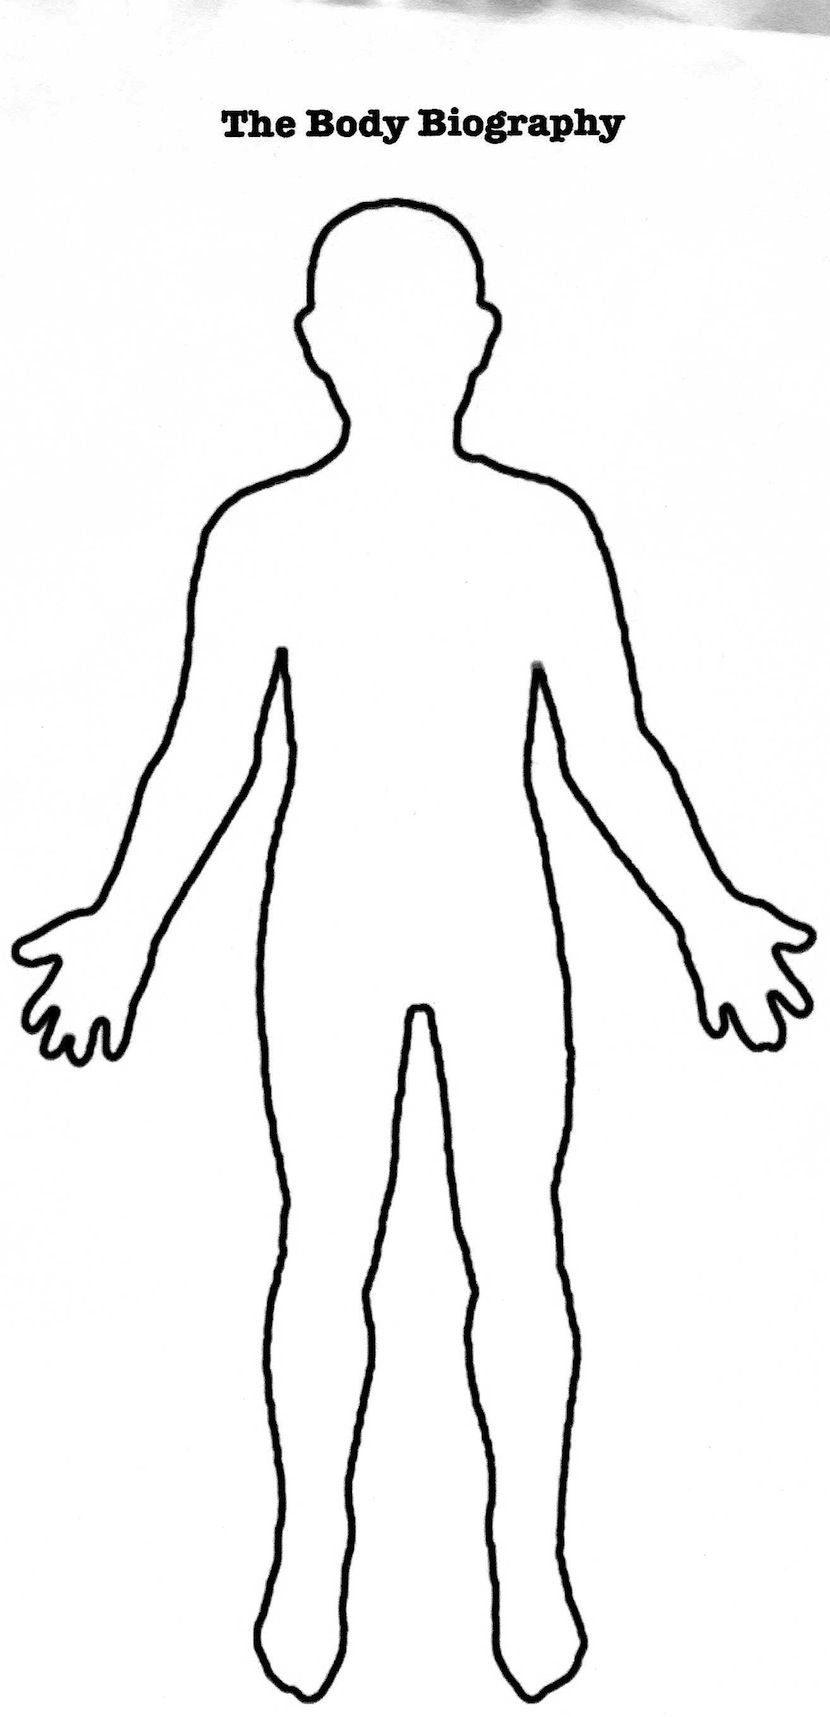 Teaching Character Analysis Using Body Biographies Scholastic